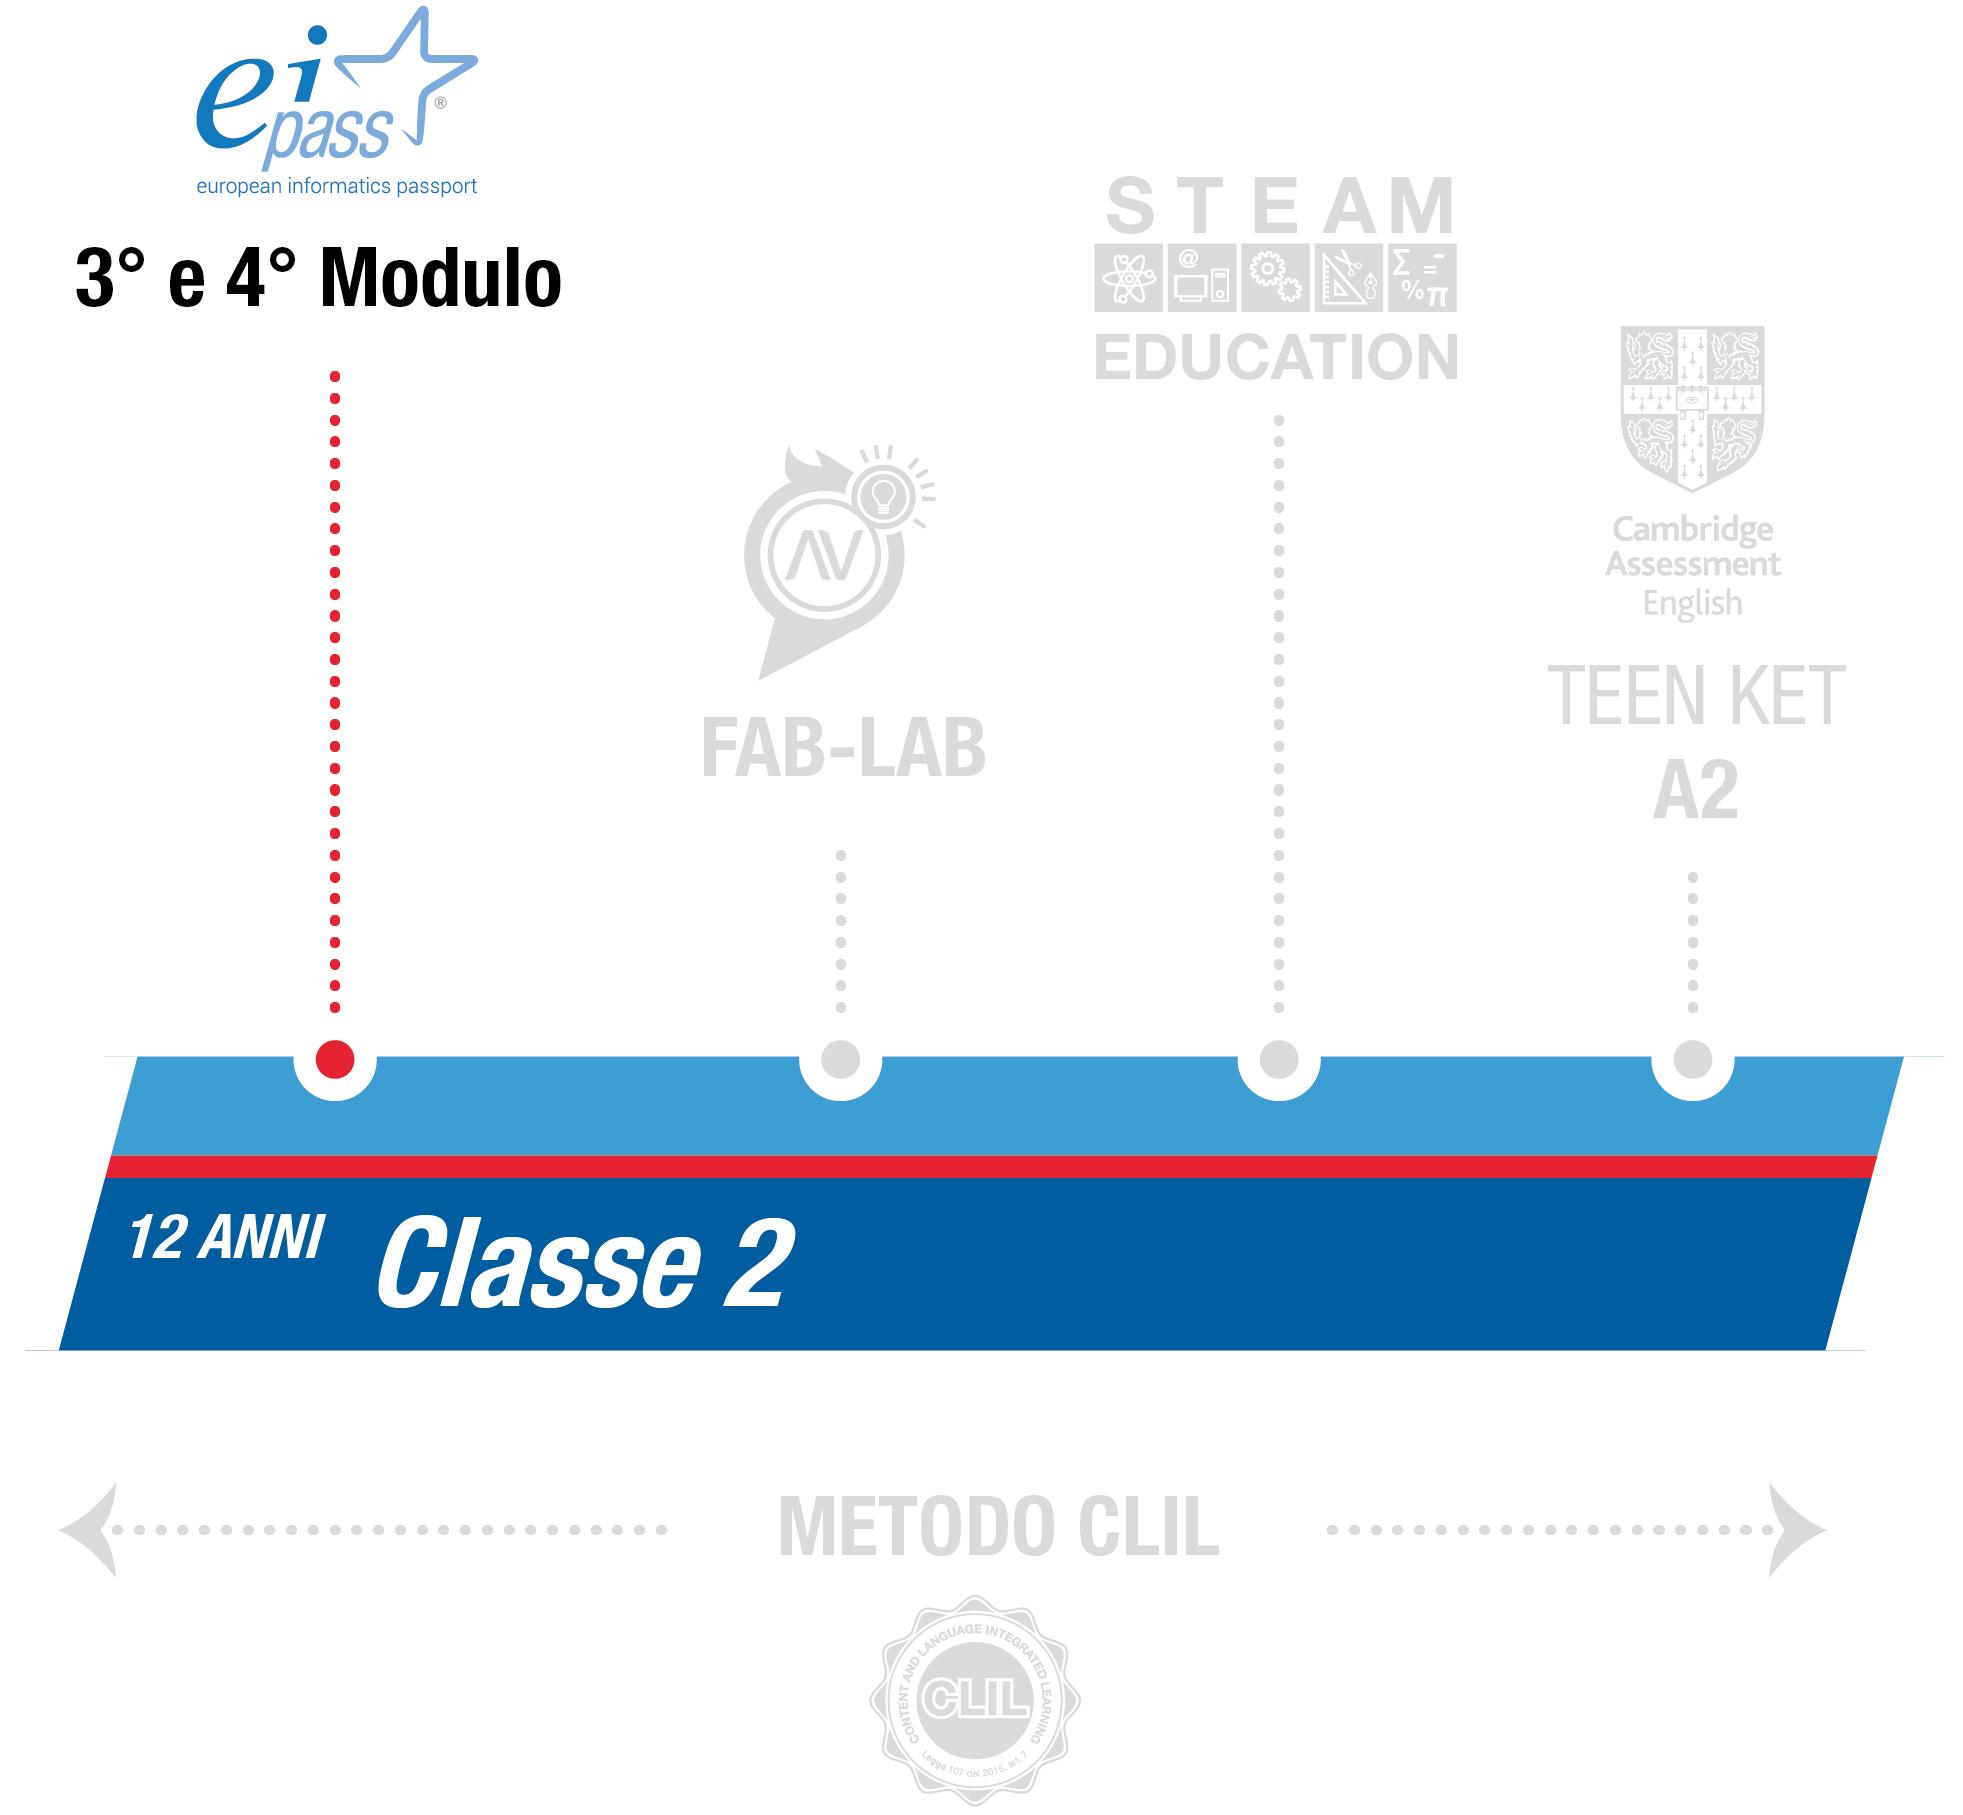 istituto-nobile-middle-school-eipass-2anno